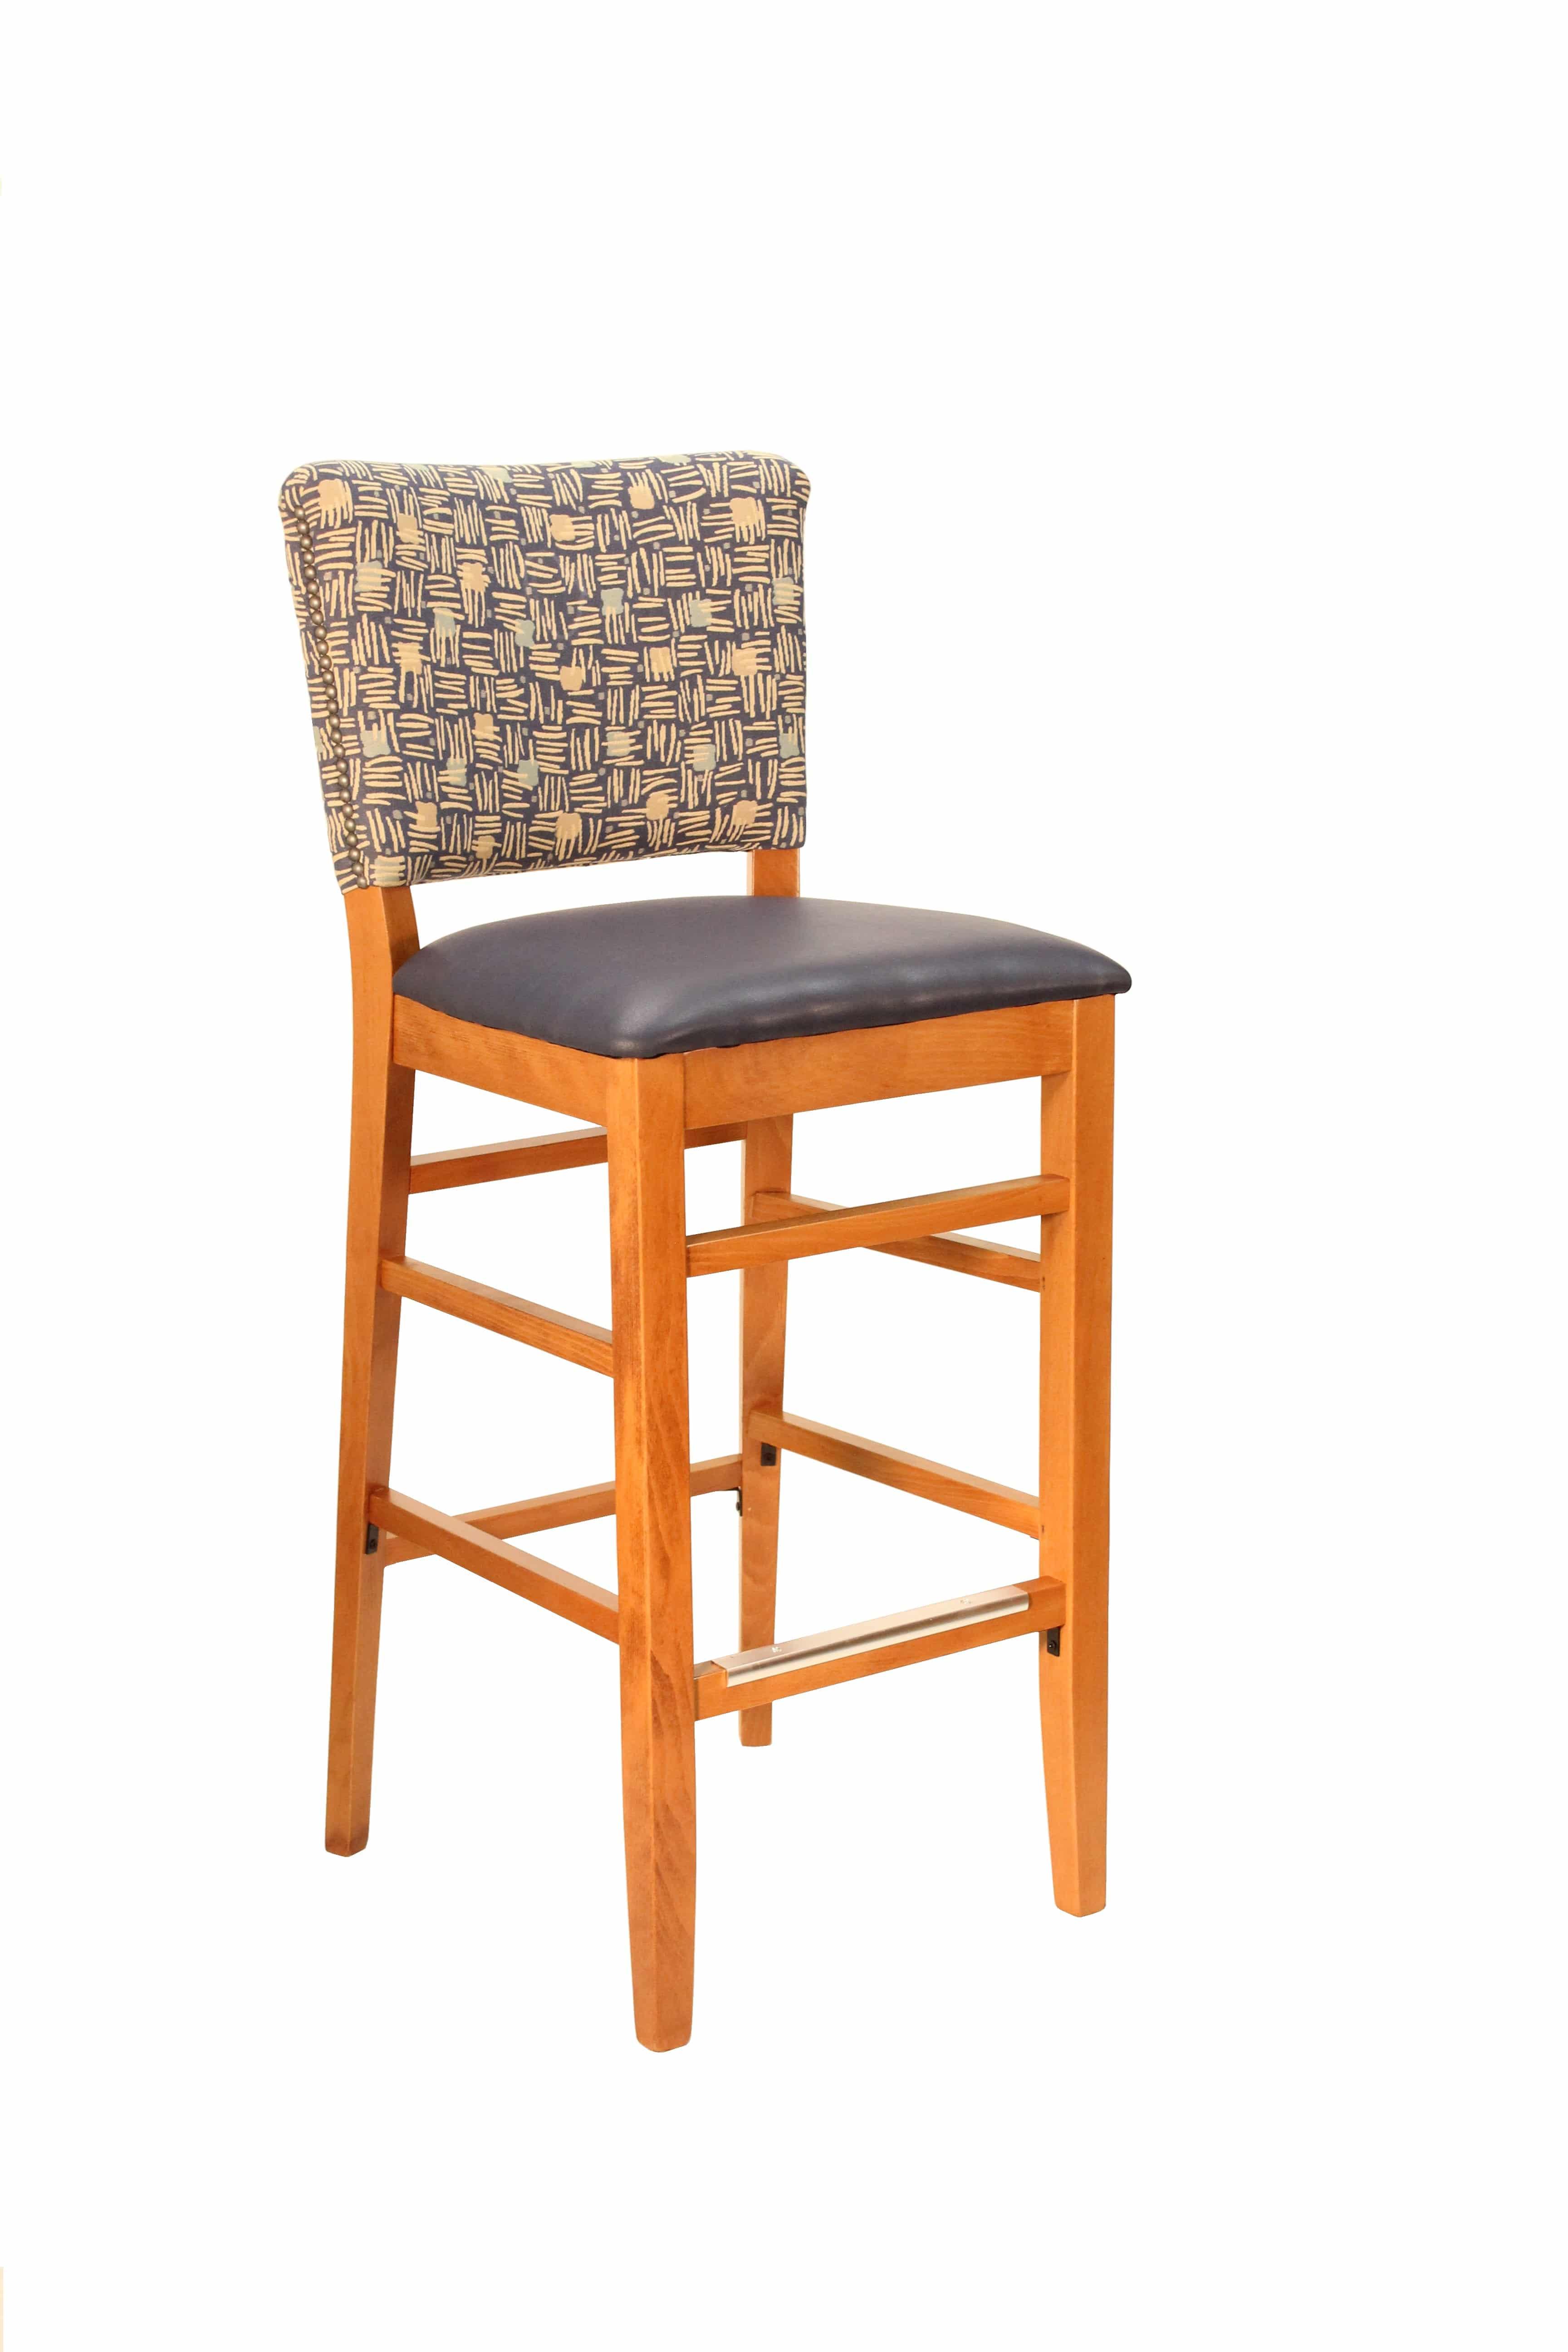 Admirable Heavy Duty Fully Padded Back Wood Bar Stool Model 1249 Ibusinesslaw Wood Chair Design Ideas Ibusinesslaworg